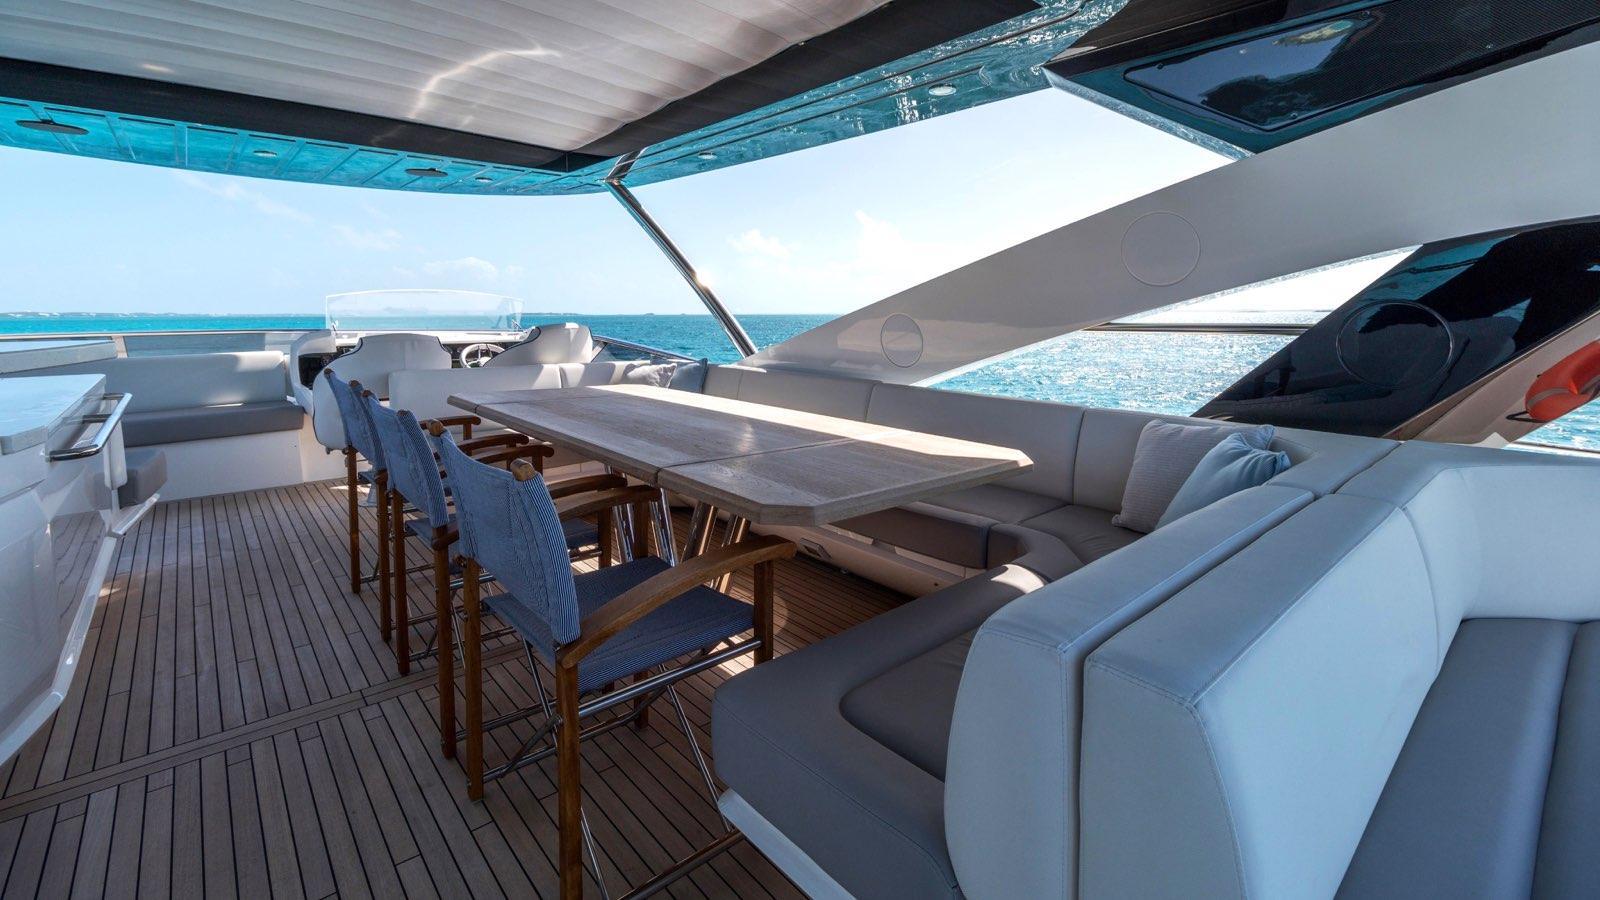 Enterprise_charter_yacht_iyc_flybridge_dining.jpeg